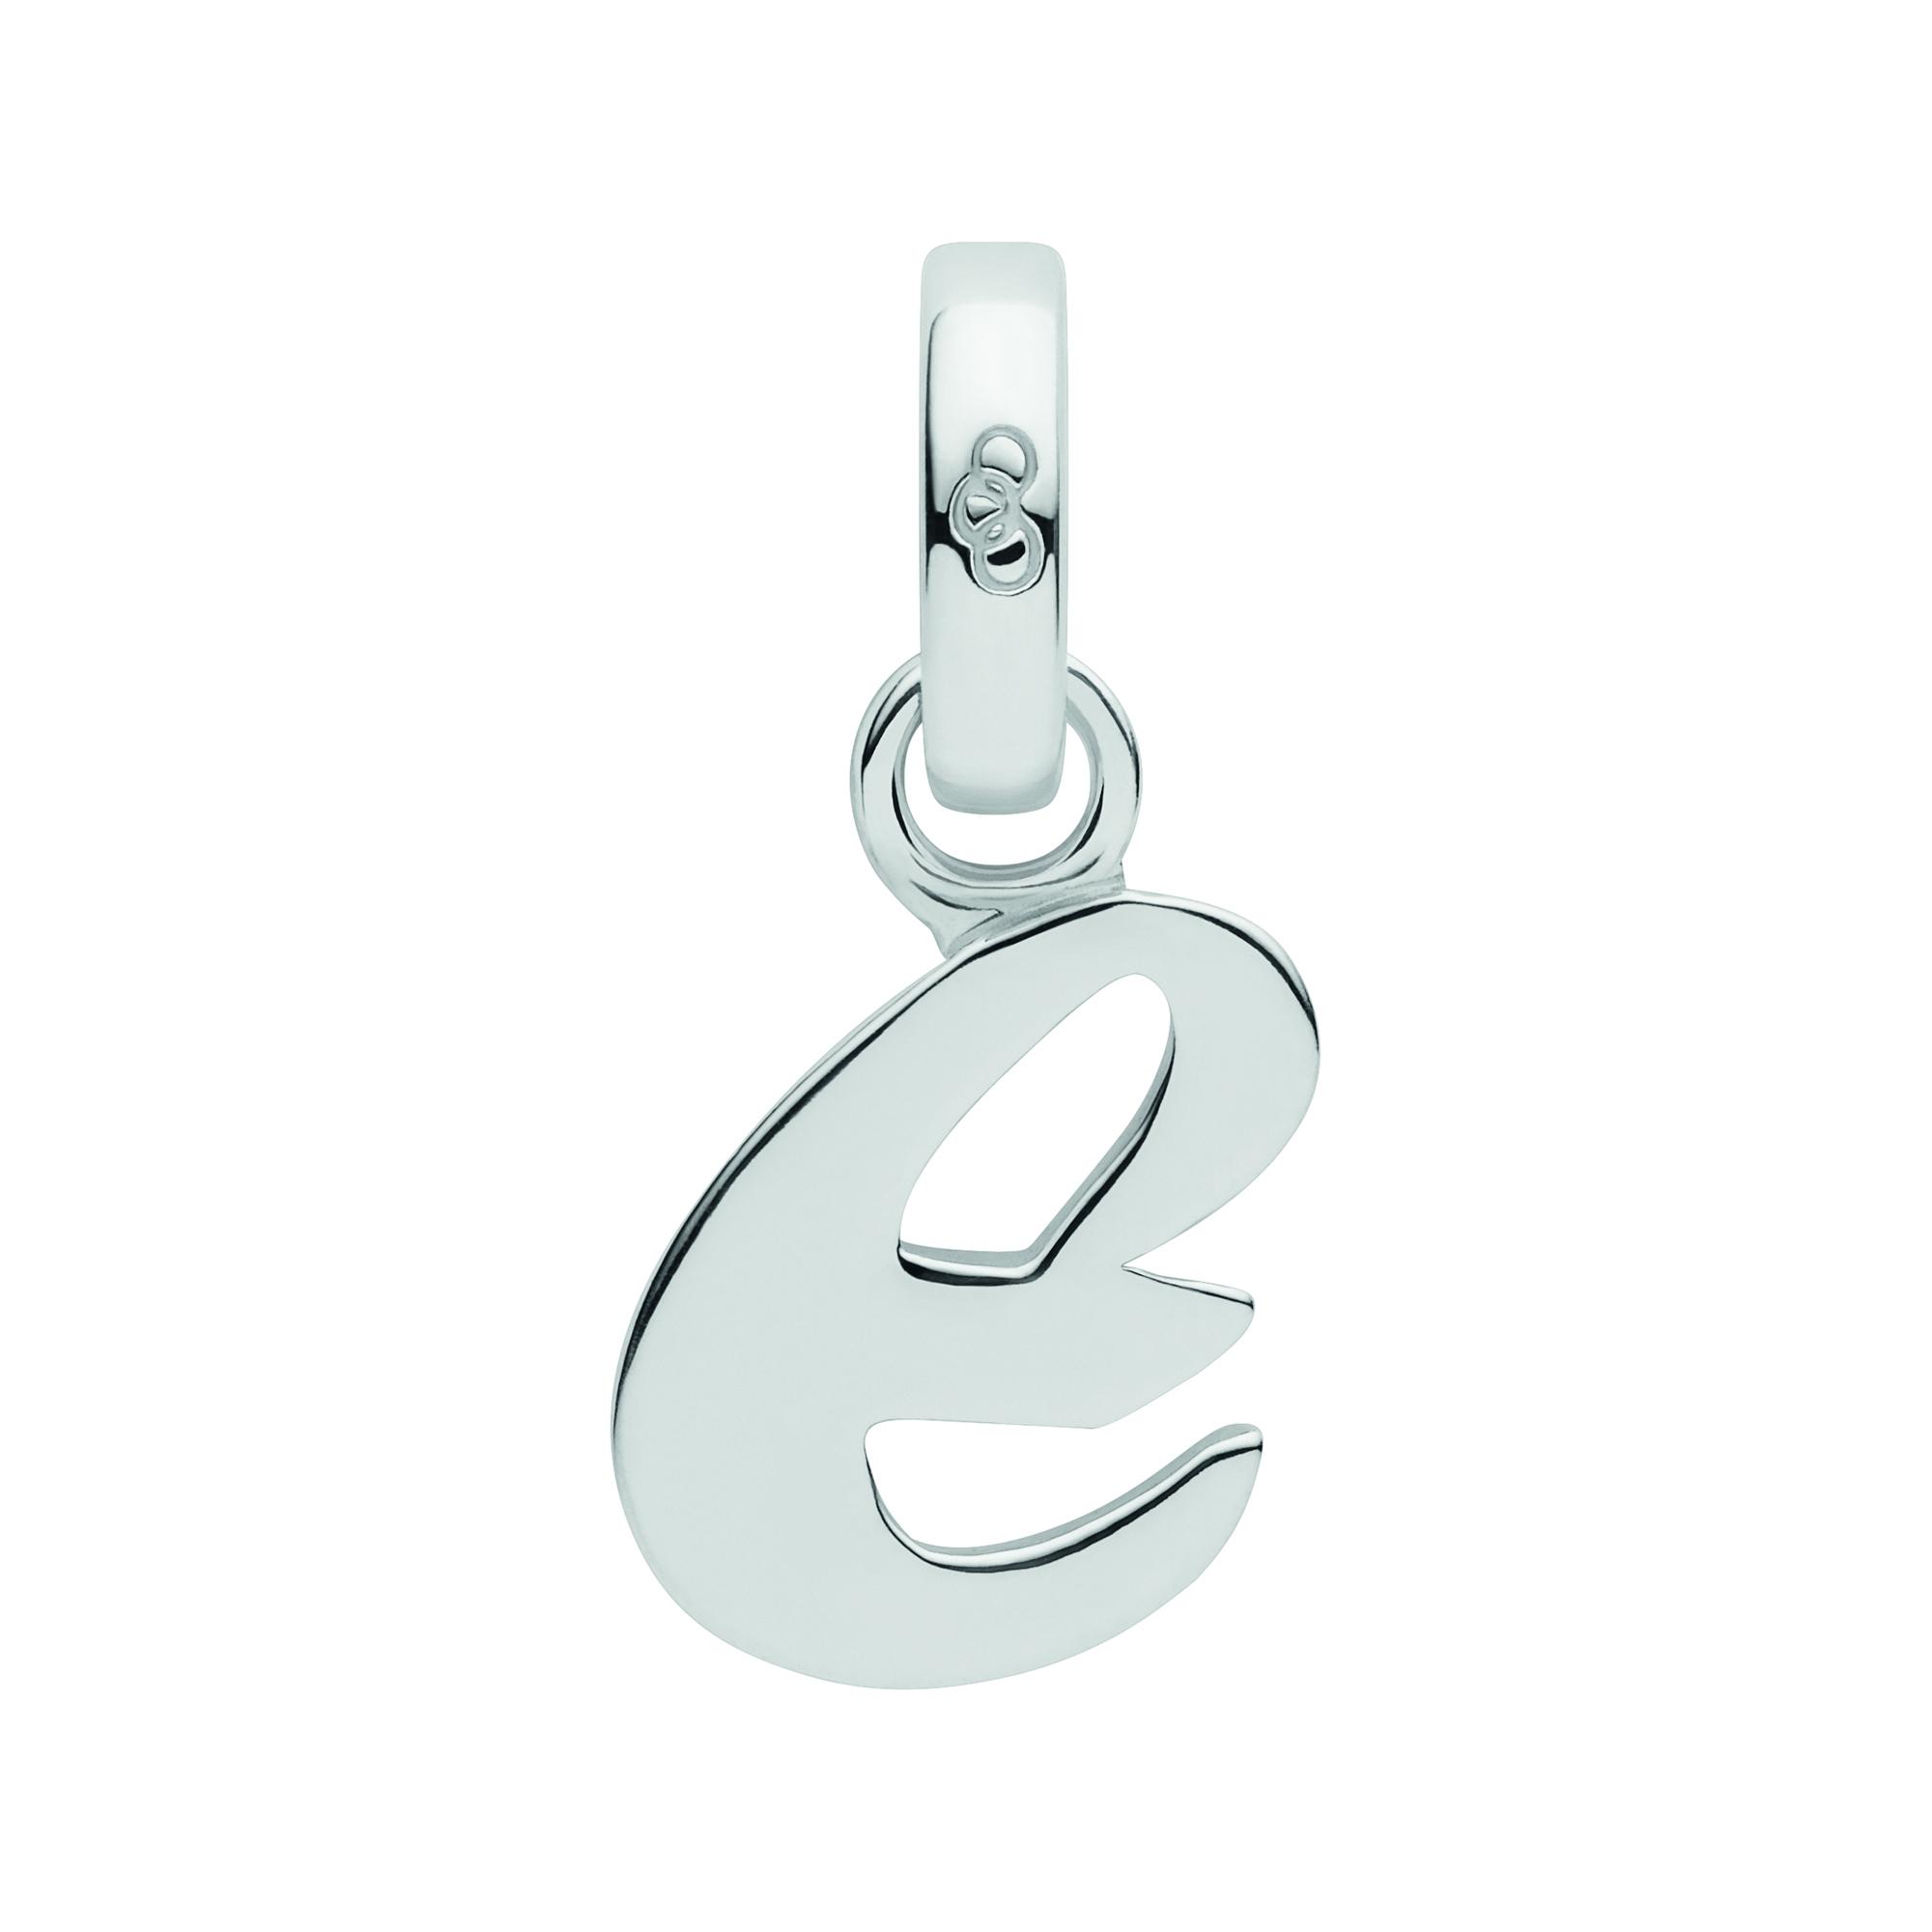 LINKS OF LONDON - Ασημένιο γούρι Alphabet Charms E γυναικεία αξεσουάρ κοσμήματα παντατίφ